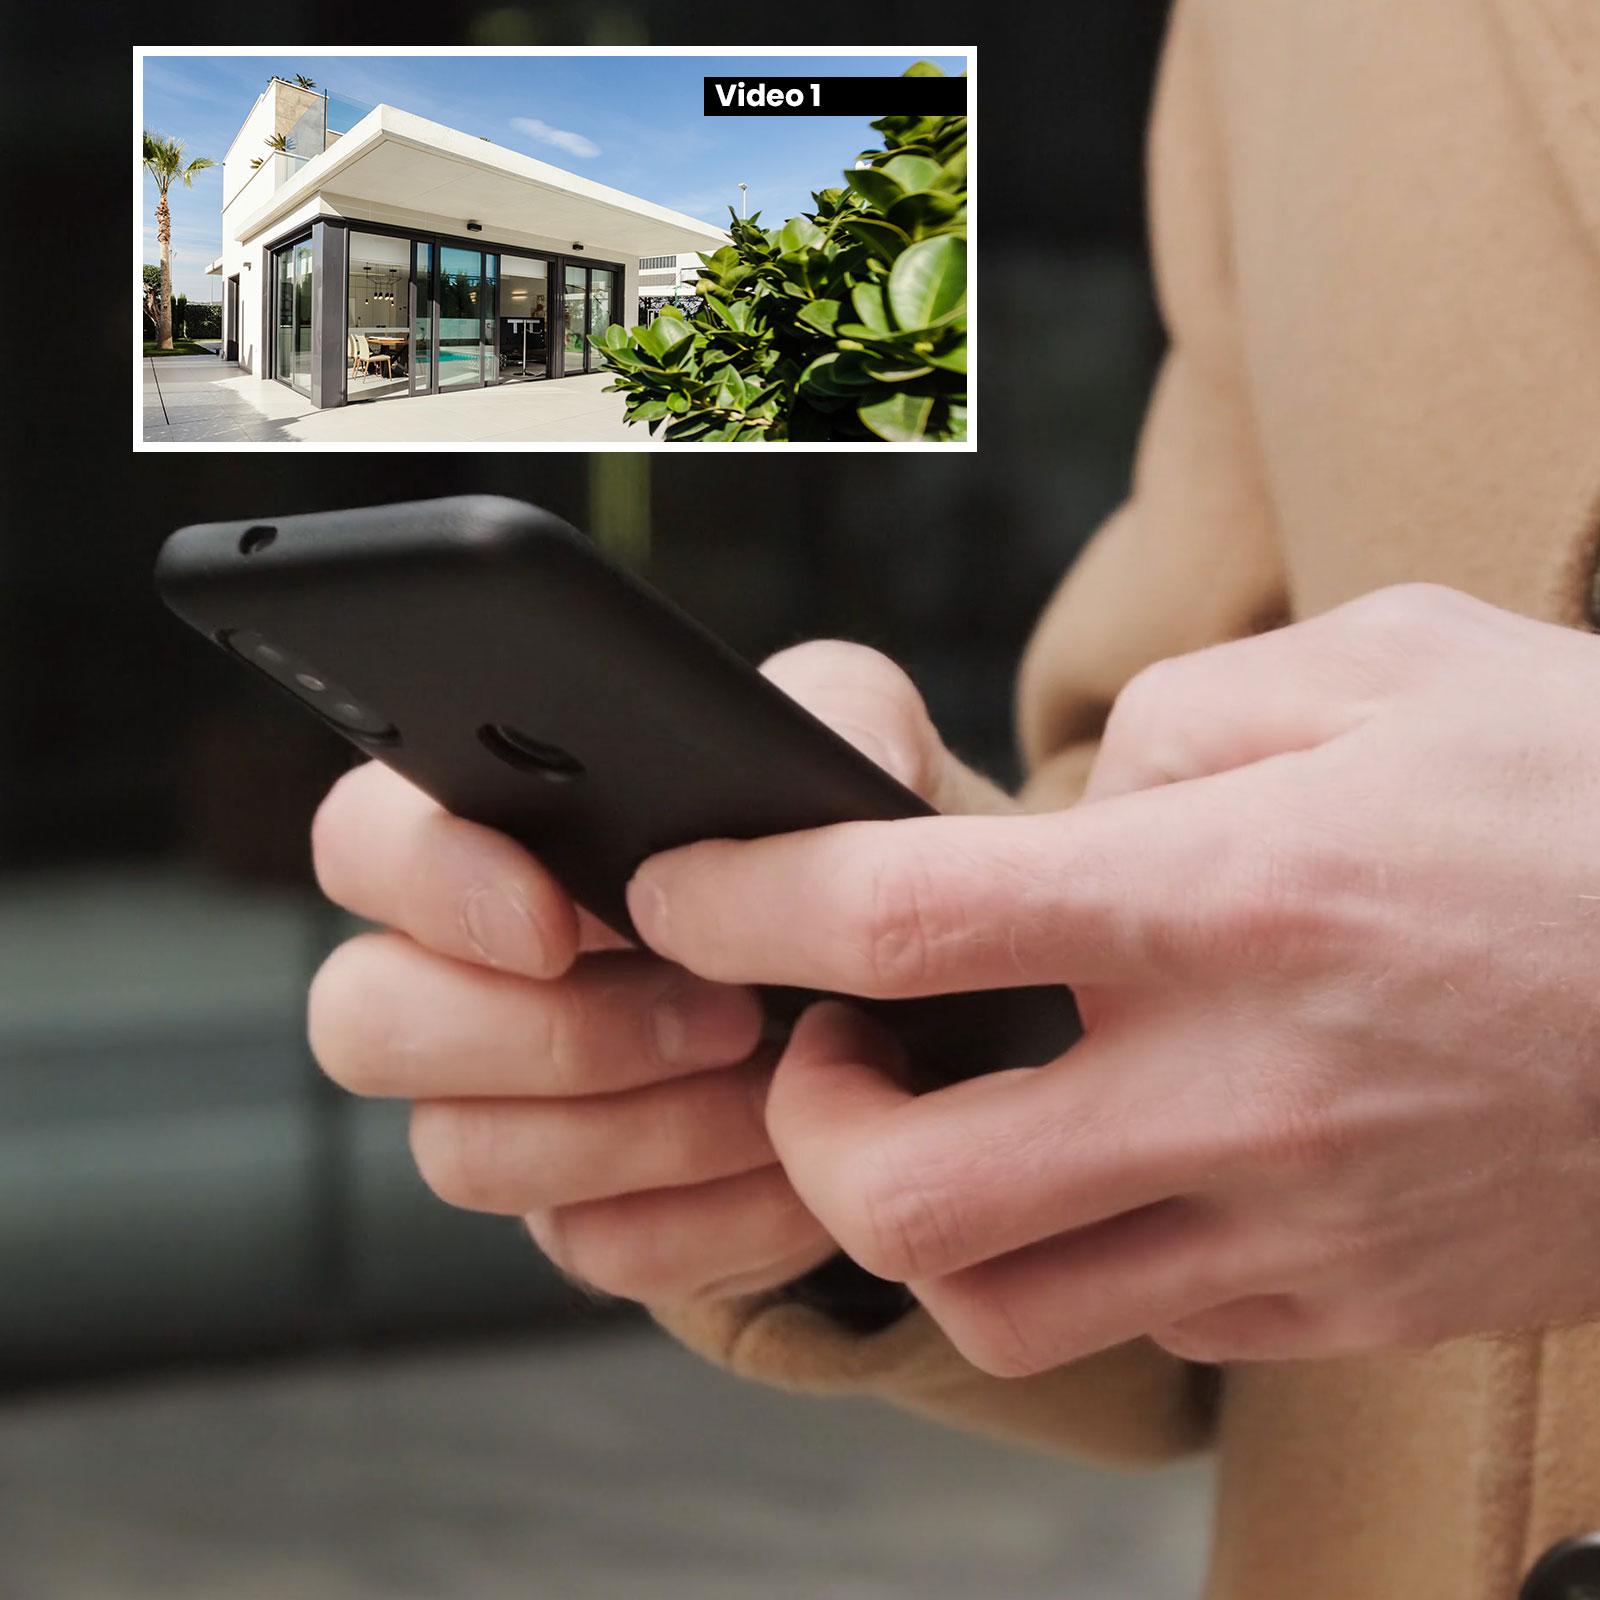 antifurto-wifi-dogma-video-verifica-schermata